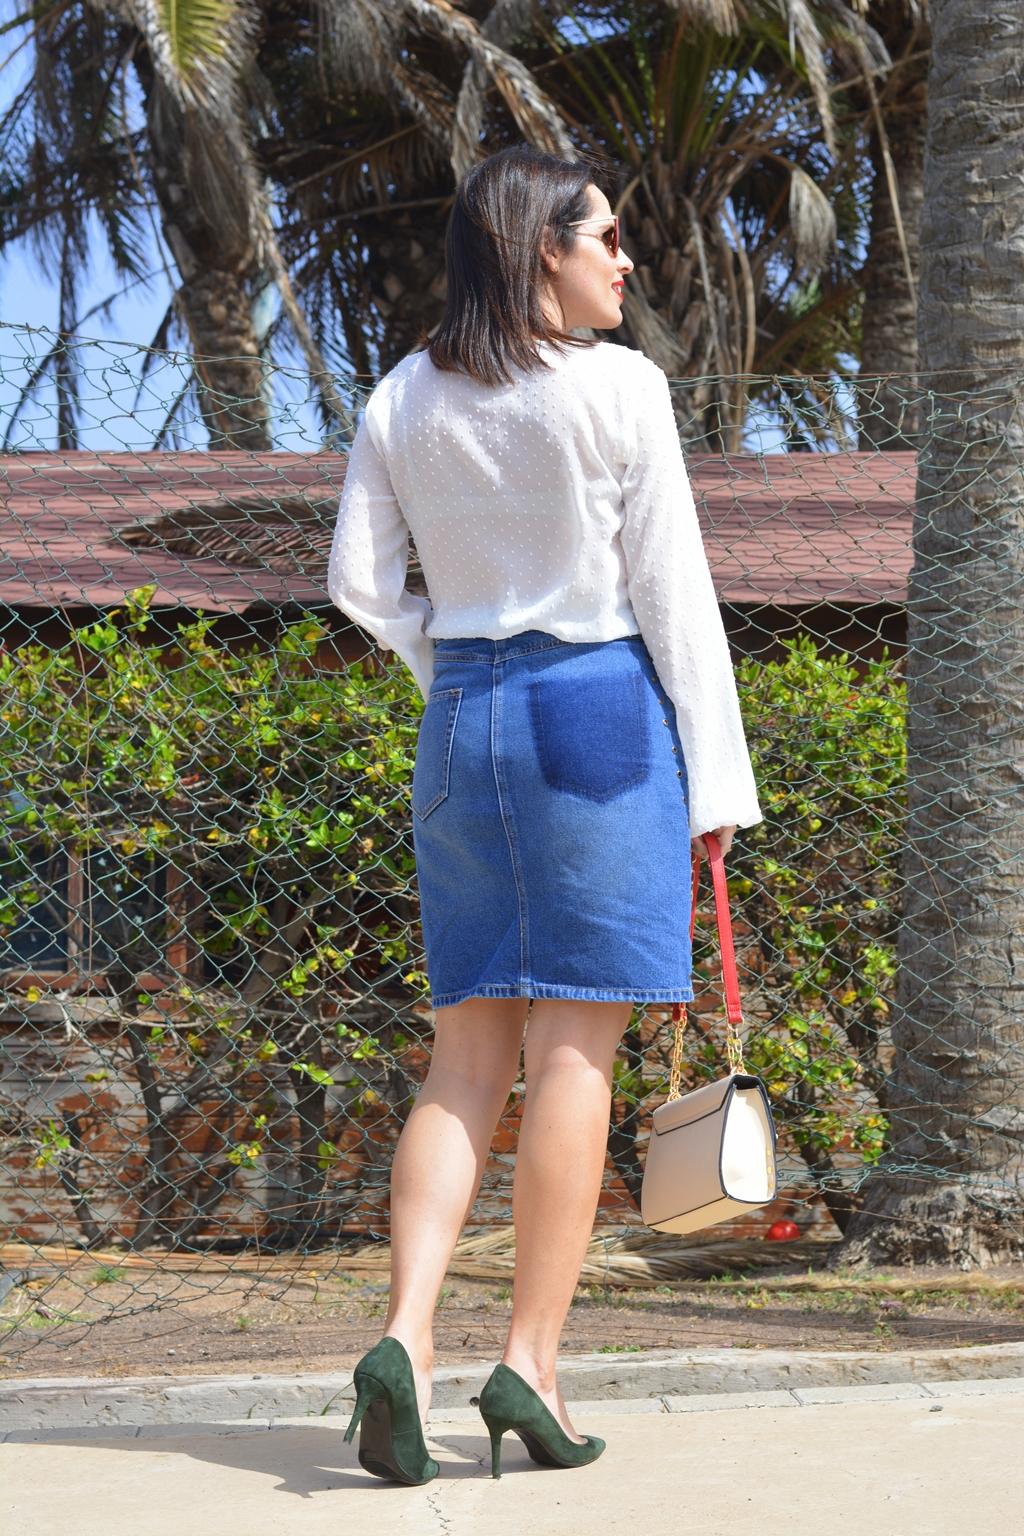 falda-denim-eyelets-stradivarius-outfit